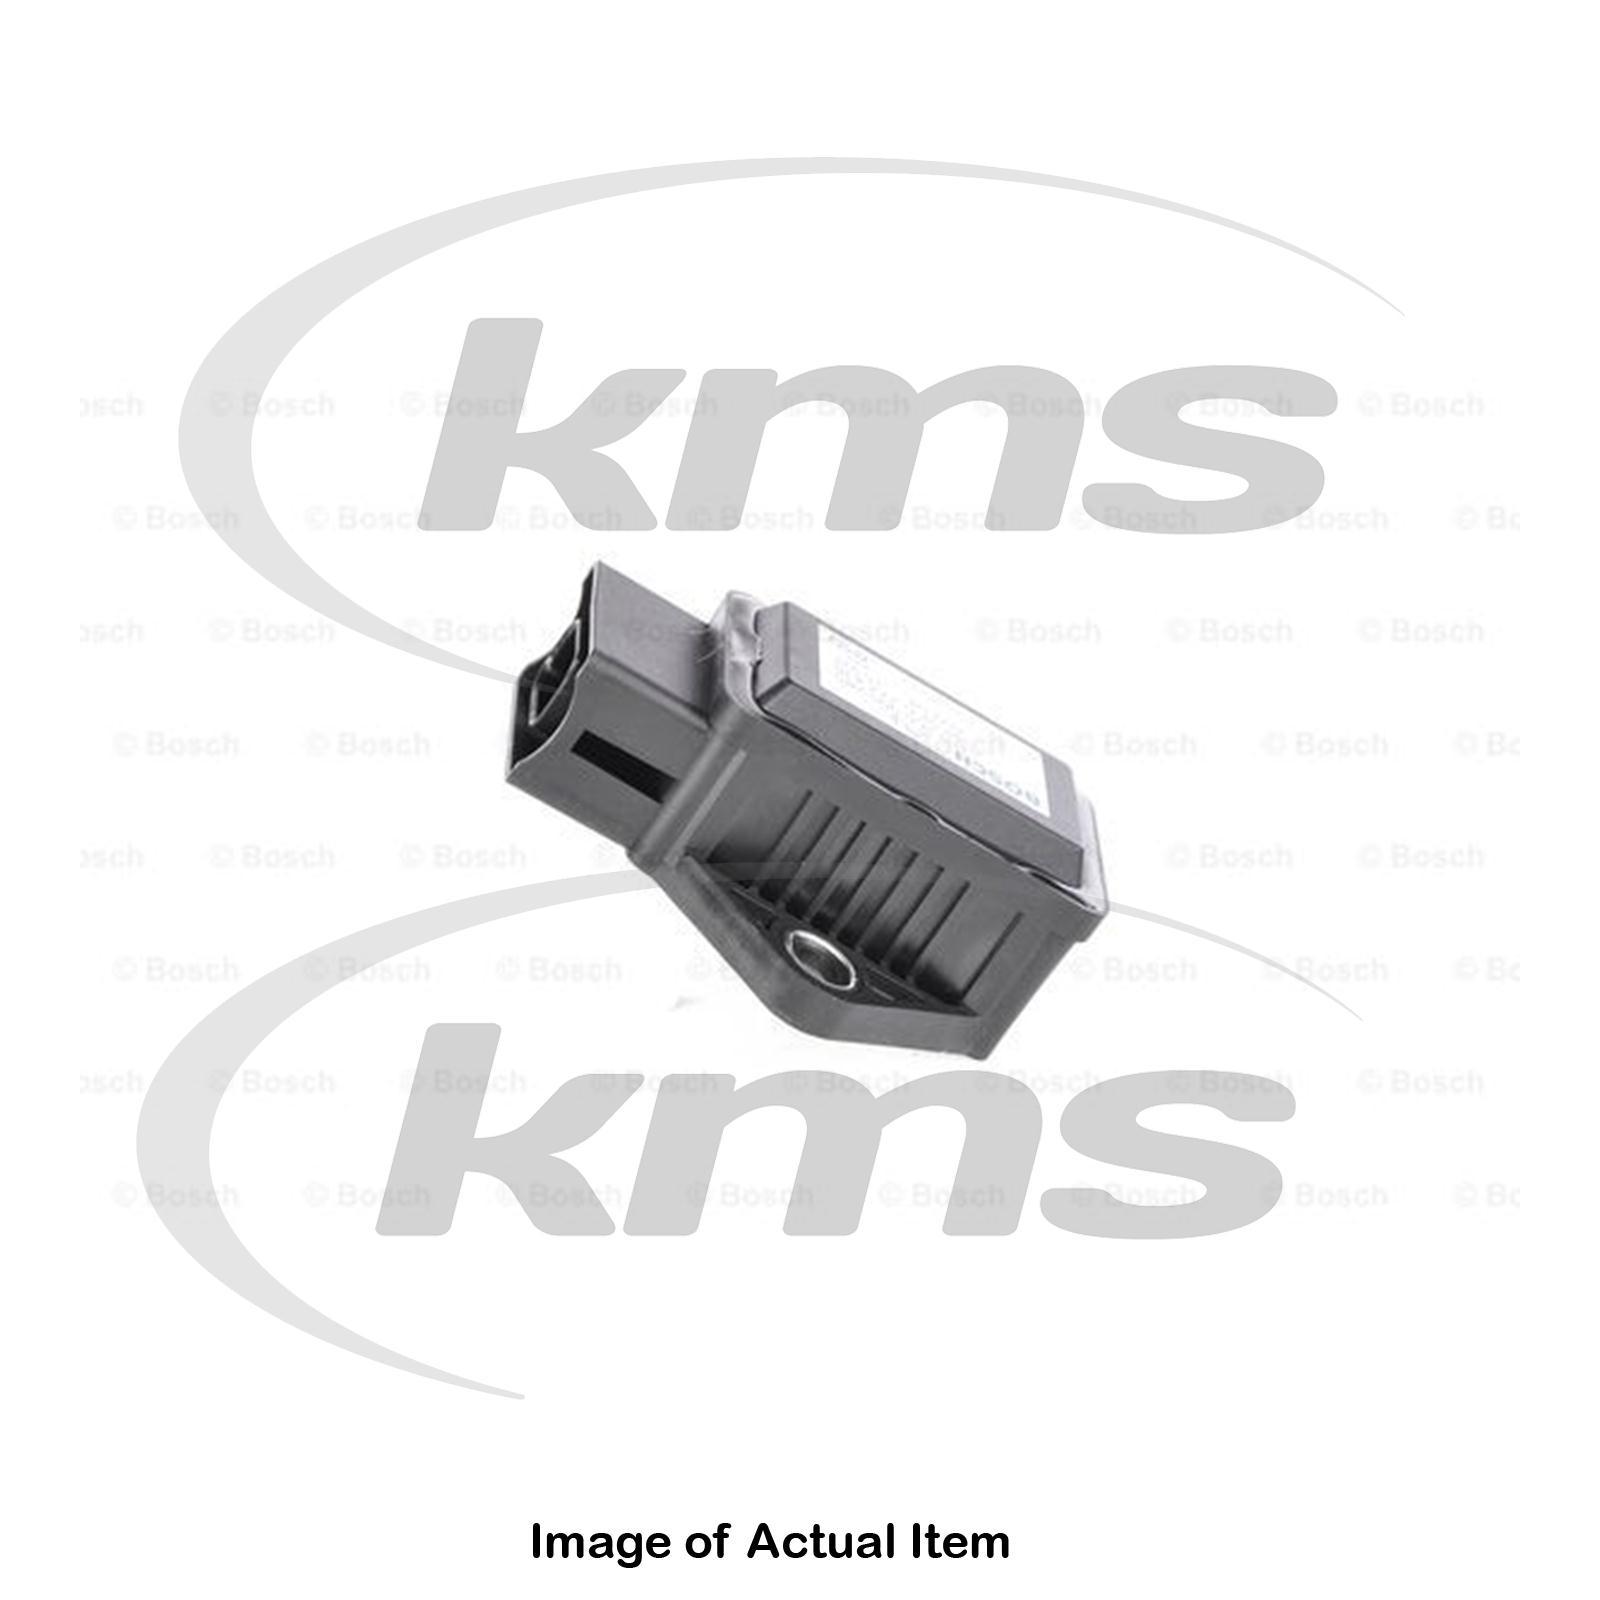 F430 Wheel Acceleration Sensors: New Genuine BOSCH Longitudinal Lateral Acceleration Sensor